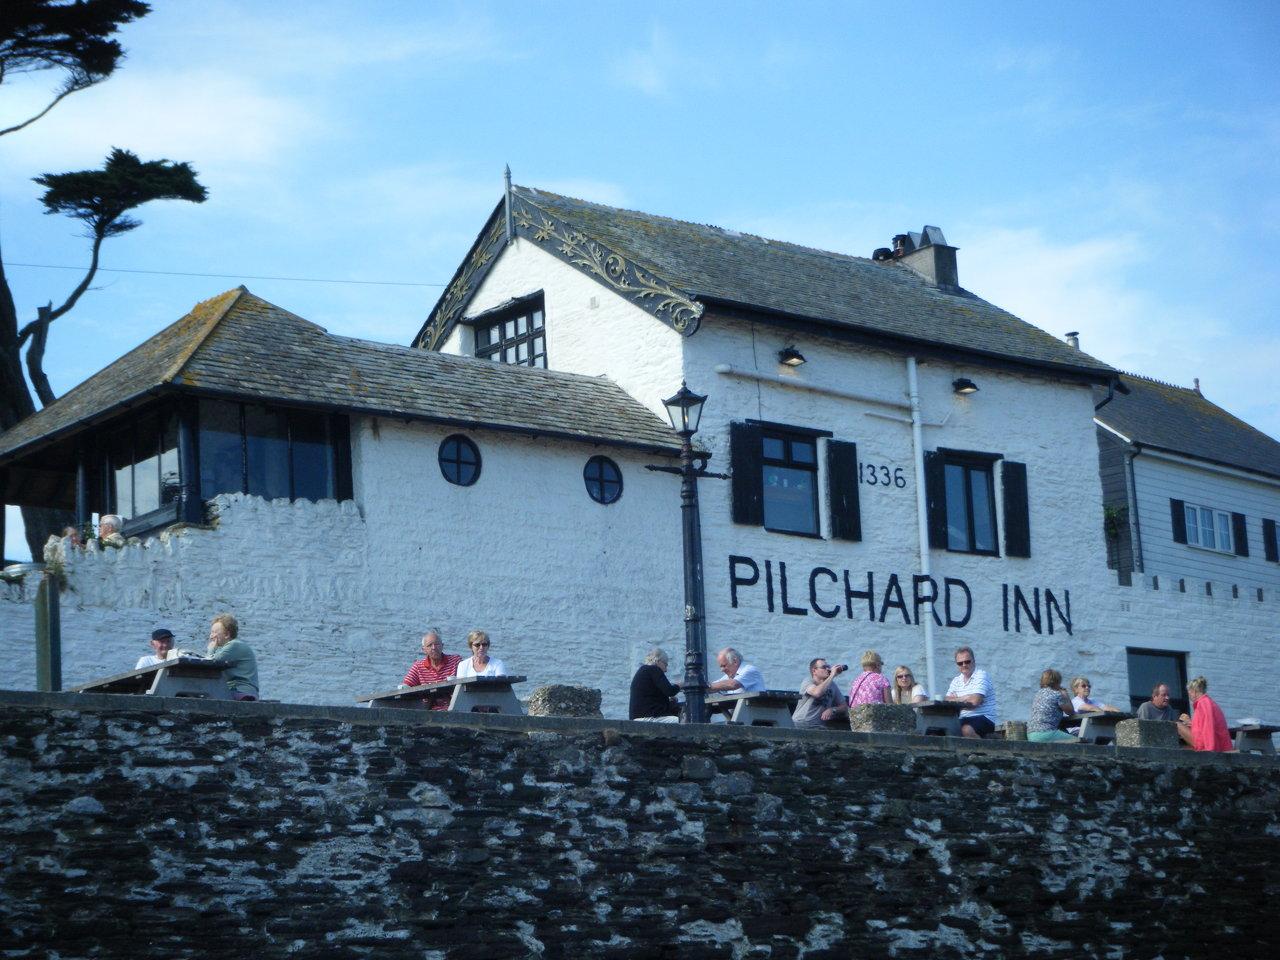 The Pilchard Inn on Burgh Island